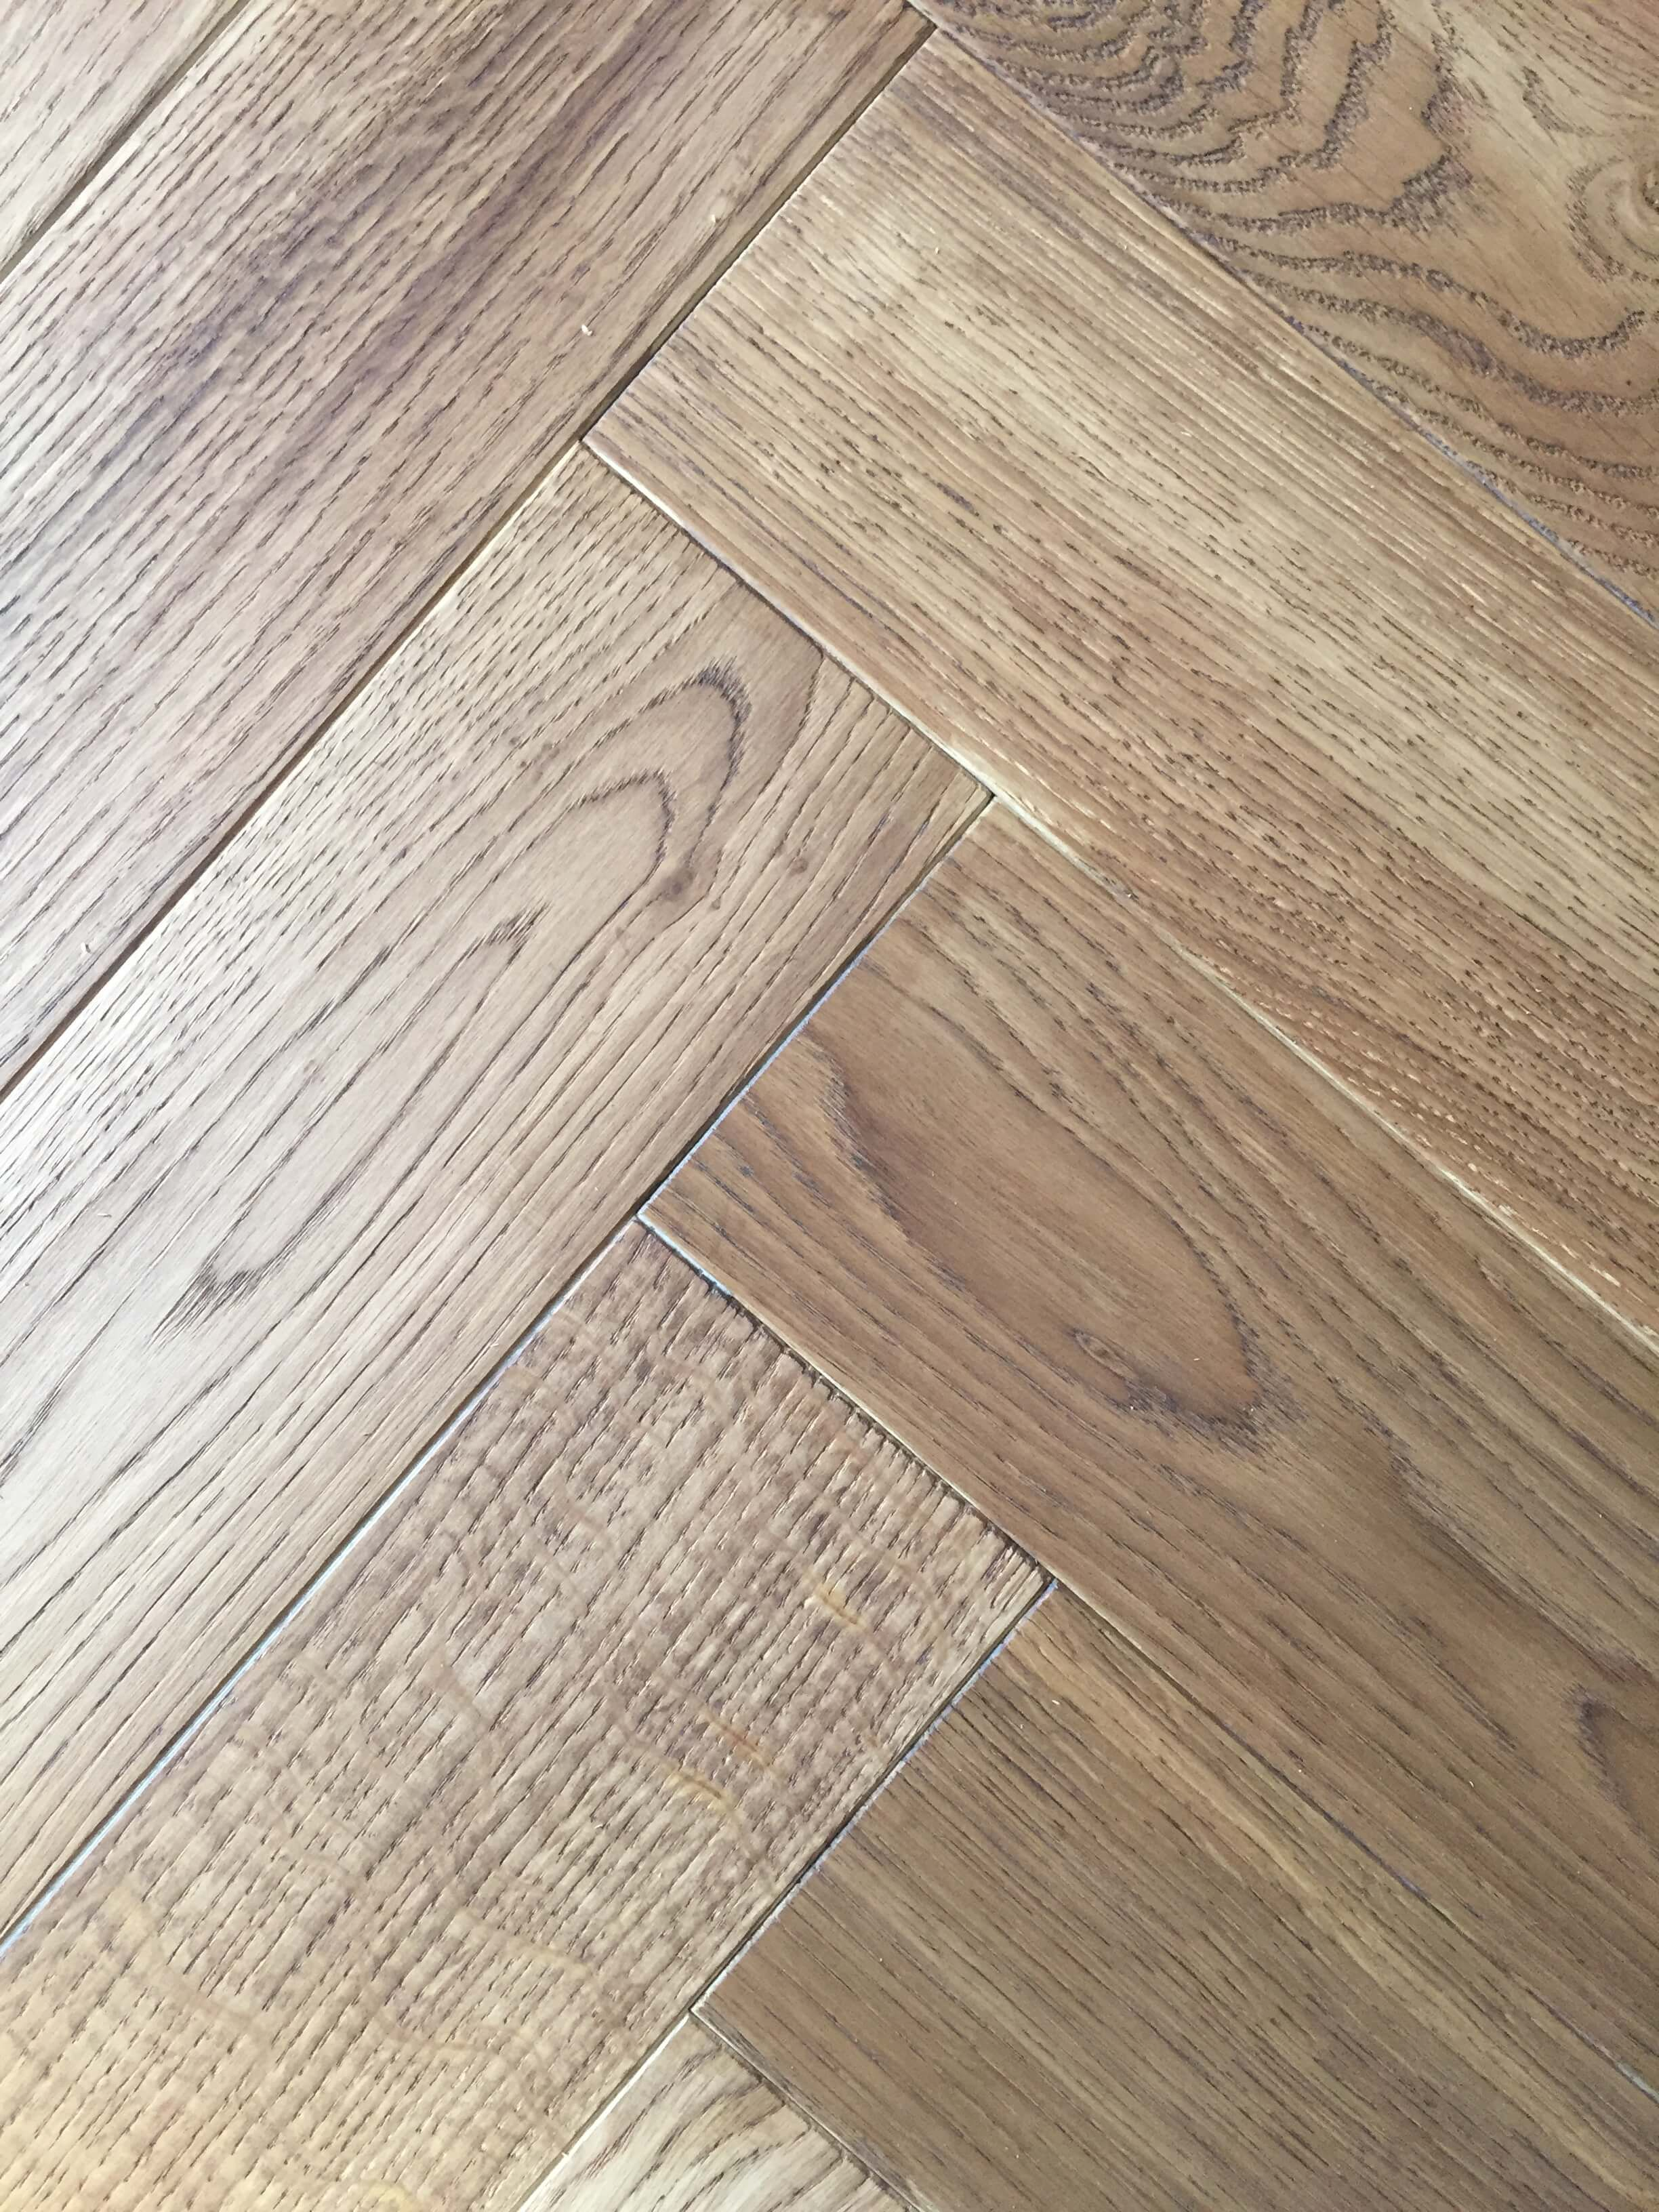 furnitureanddecors decor appeal higher and visual com for parquet flooring texture adding floor